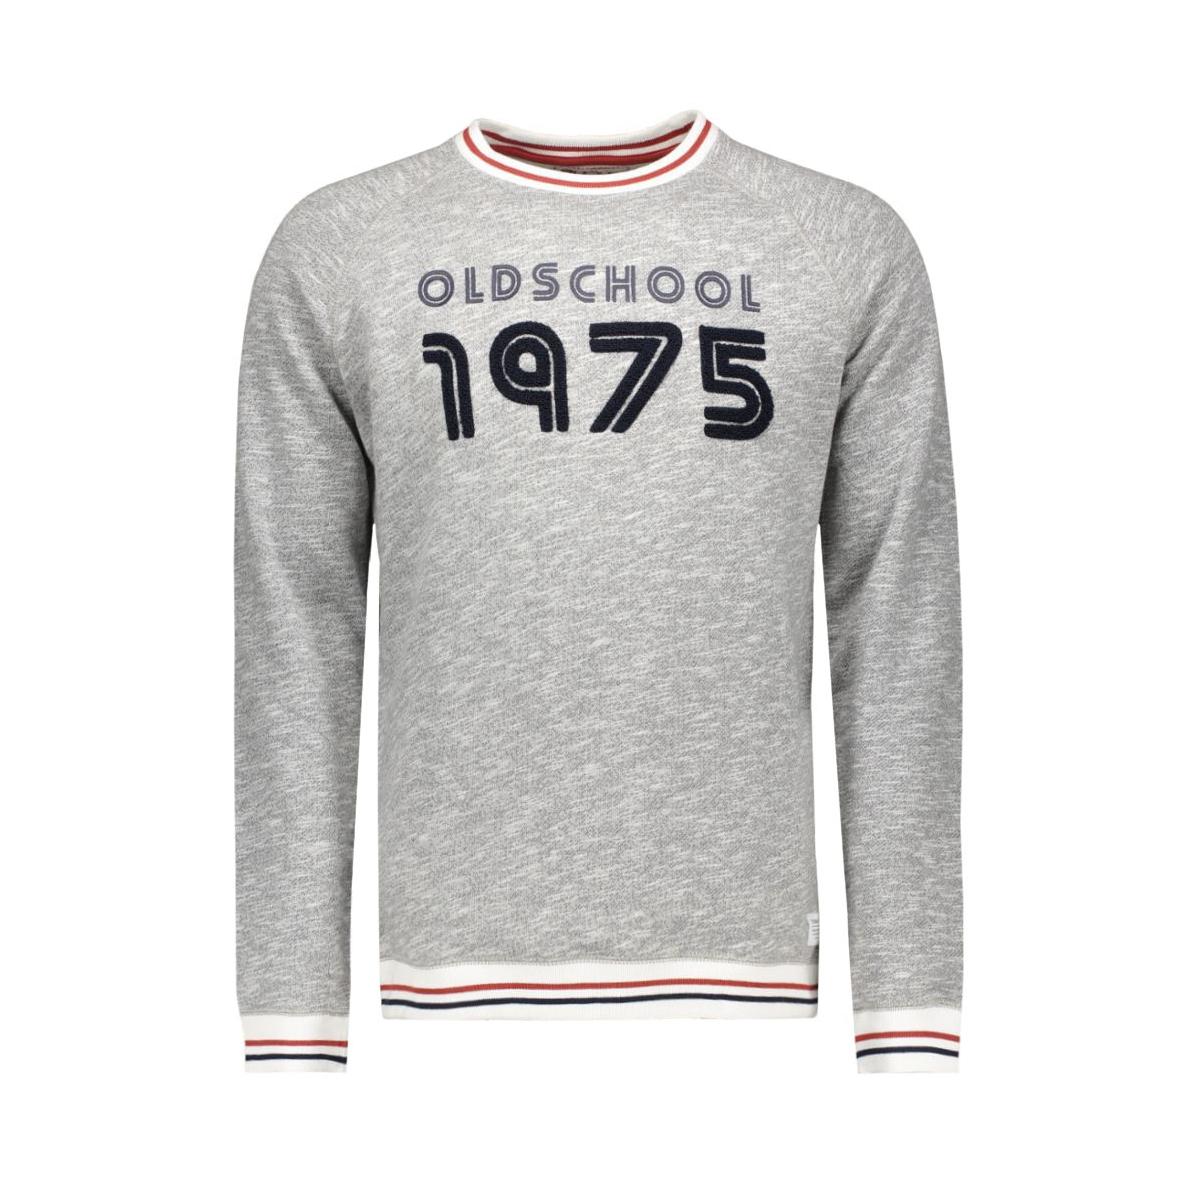 2530433.00.12 tom tailor sweater 2801